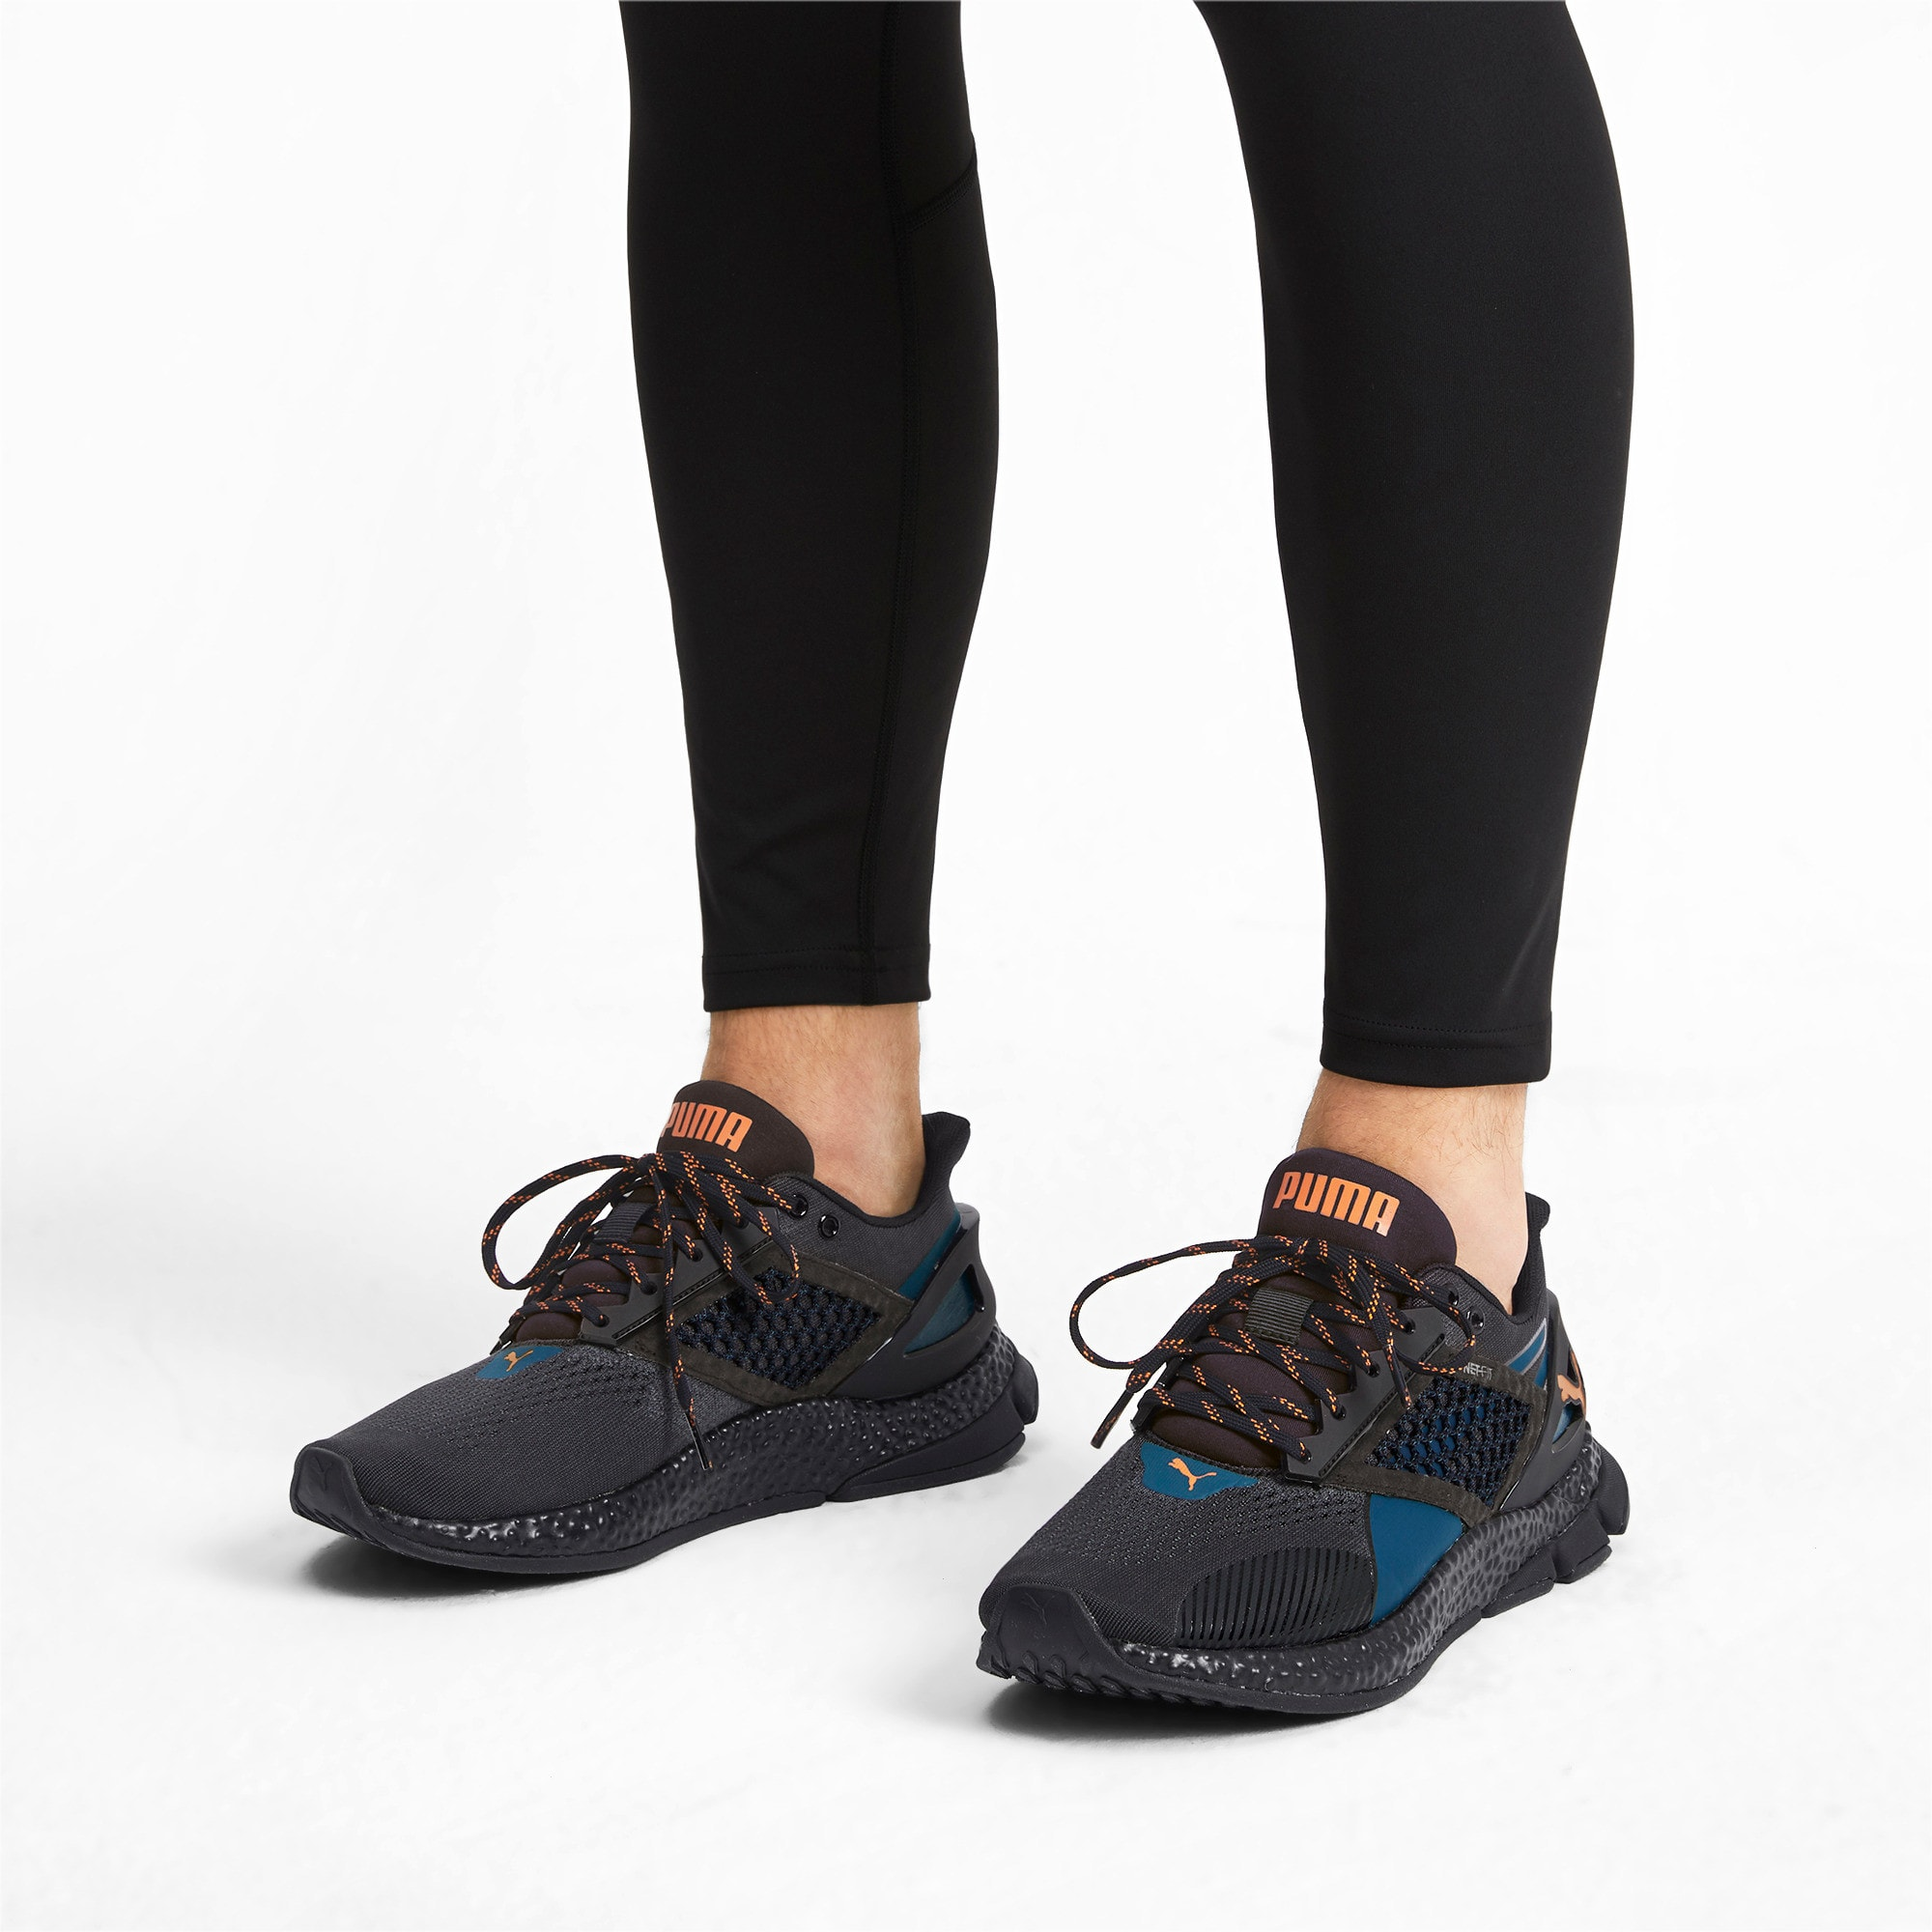 Imagen en miniatura 2 de Zapatillas de running de hombre HYBRID NETFIT Astro, Gibraltar Sea-Puma Black, mediana